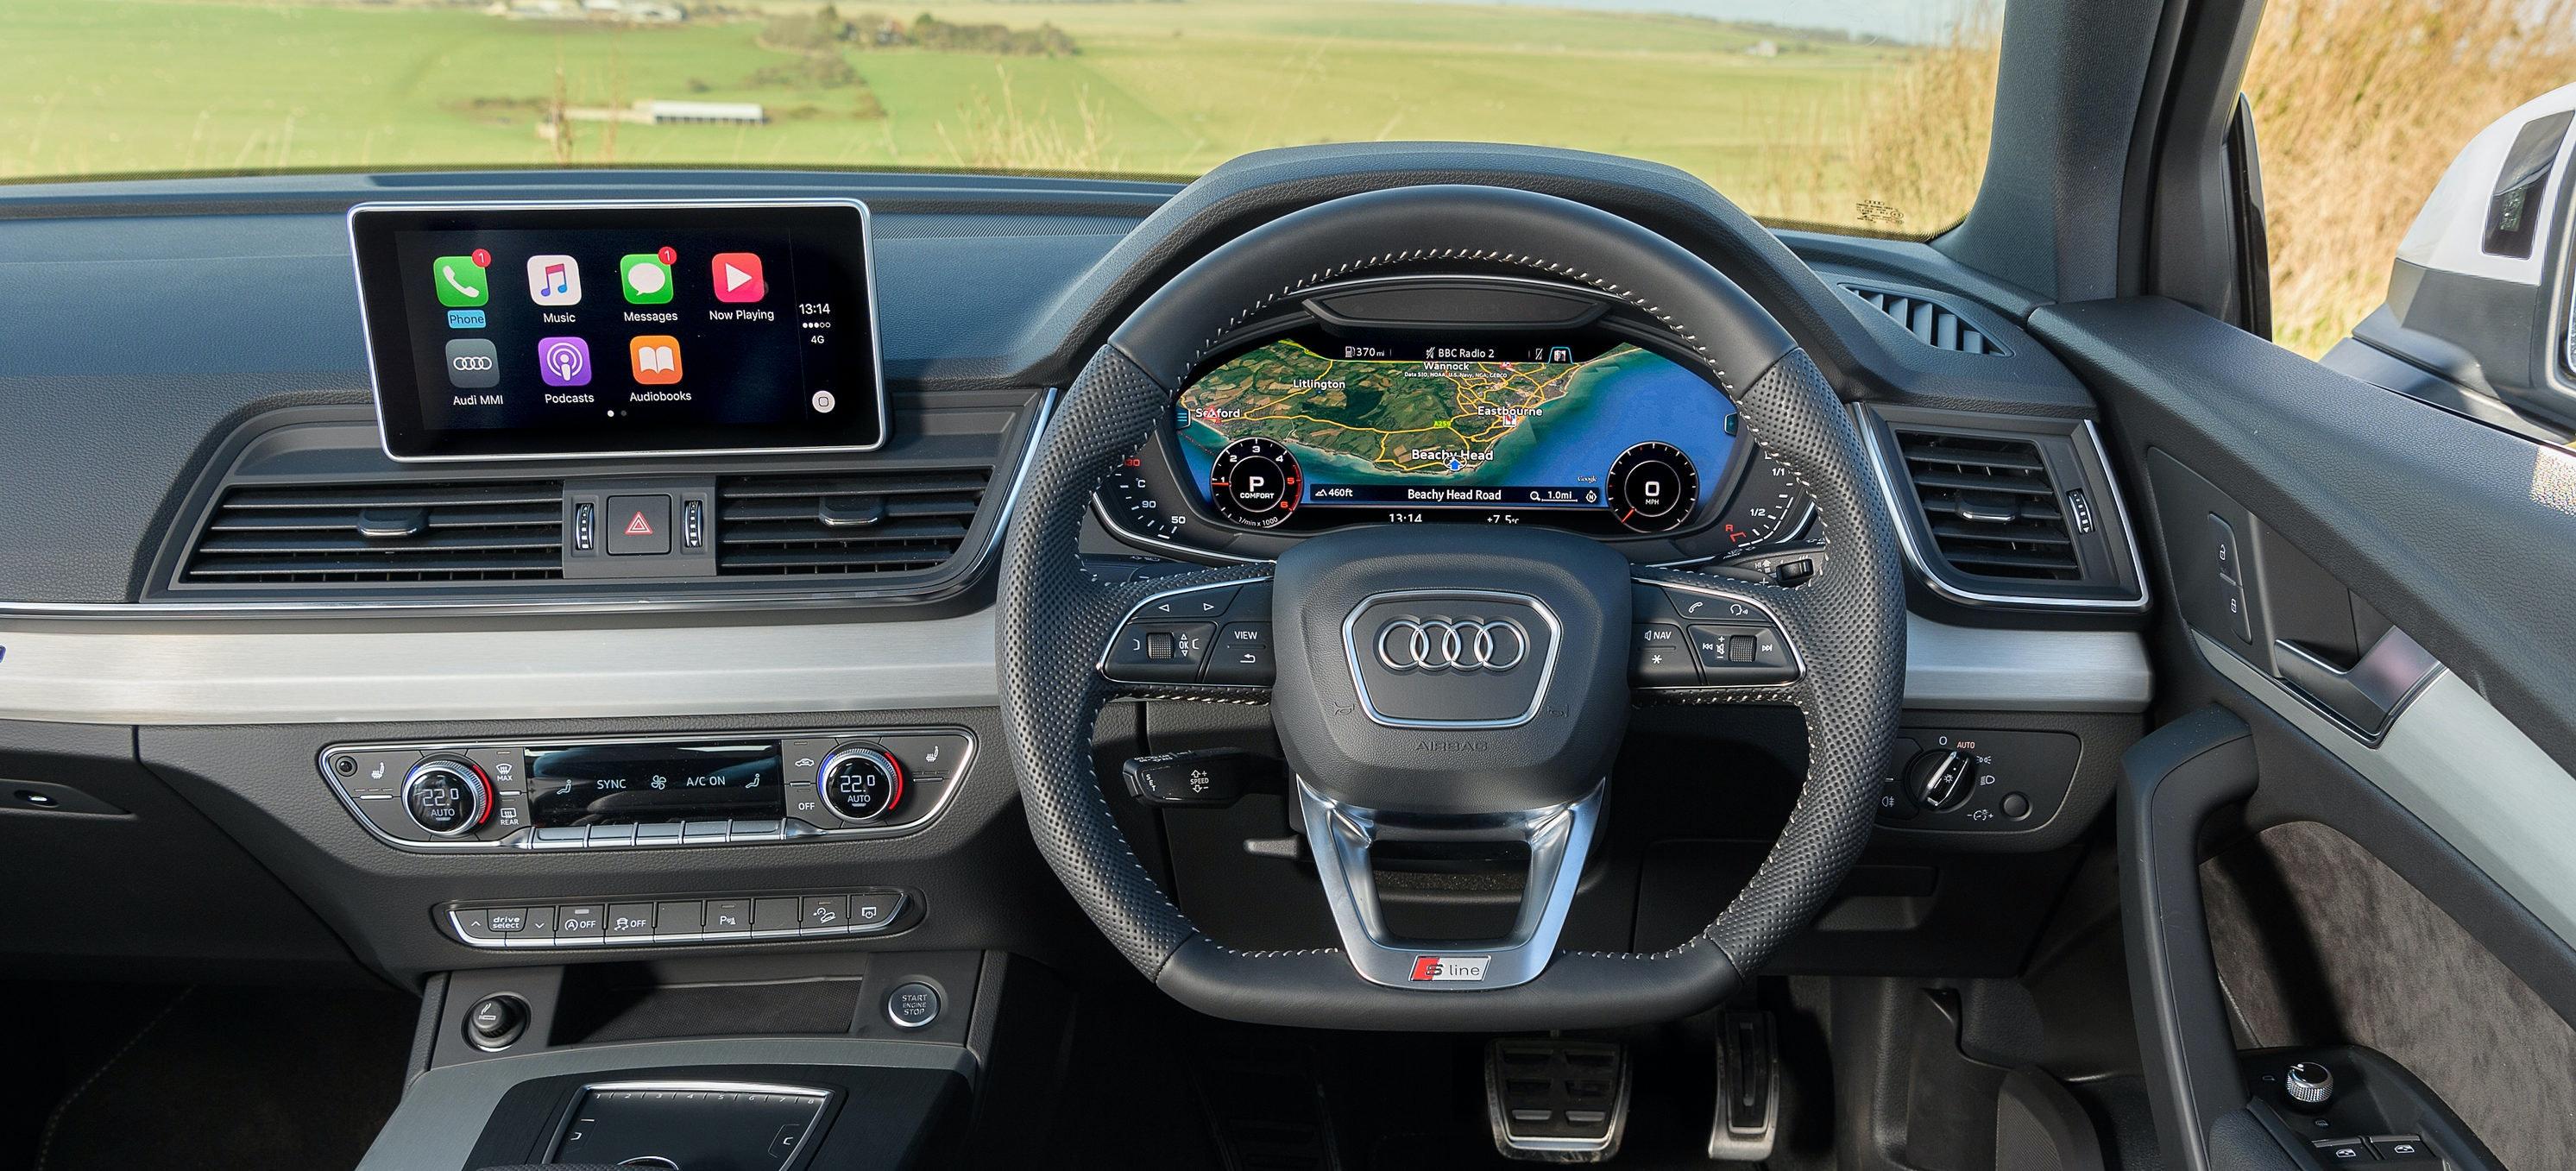 audi q5 interior infotainment carwow rh carwow co uk 2016 Audi Q5 Interior 2015 Audi Q5 Interior